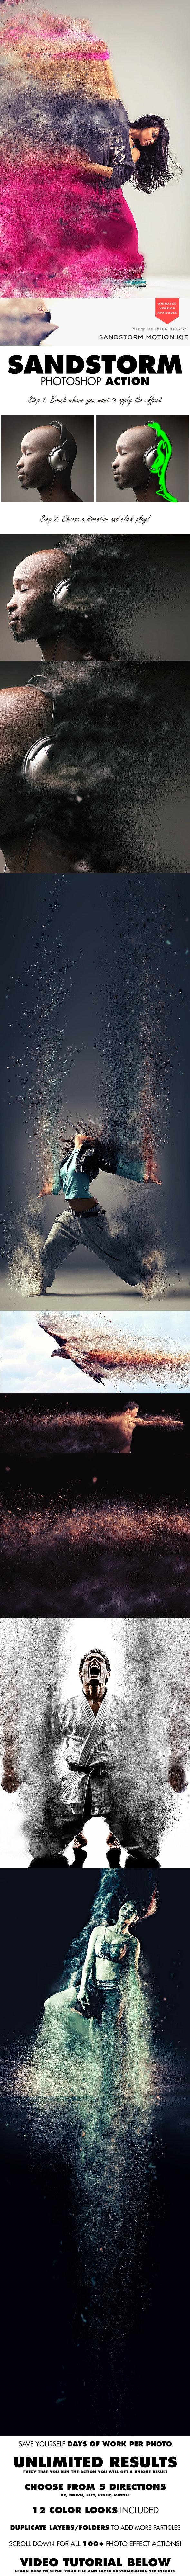 Photoshop Aktion Sandstorm